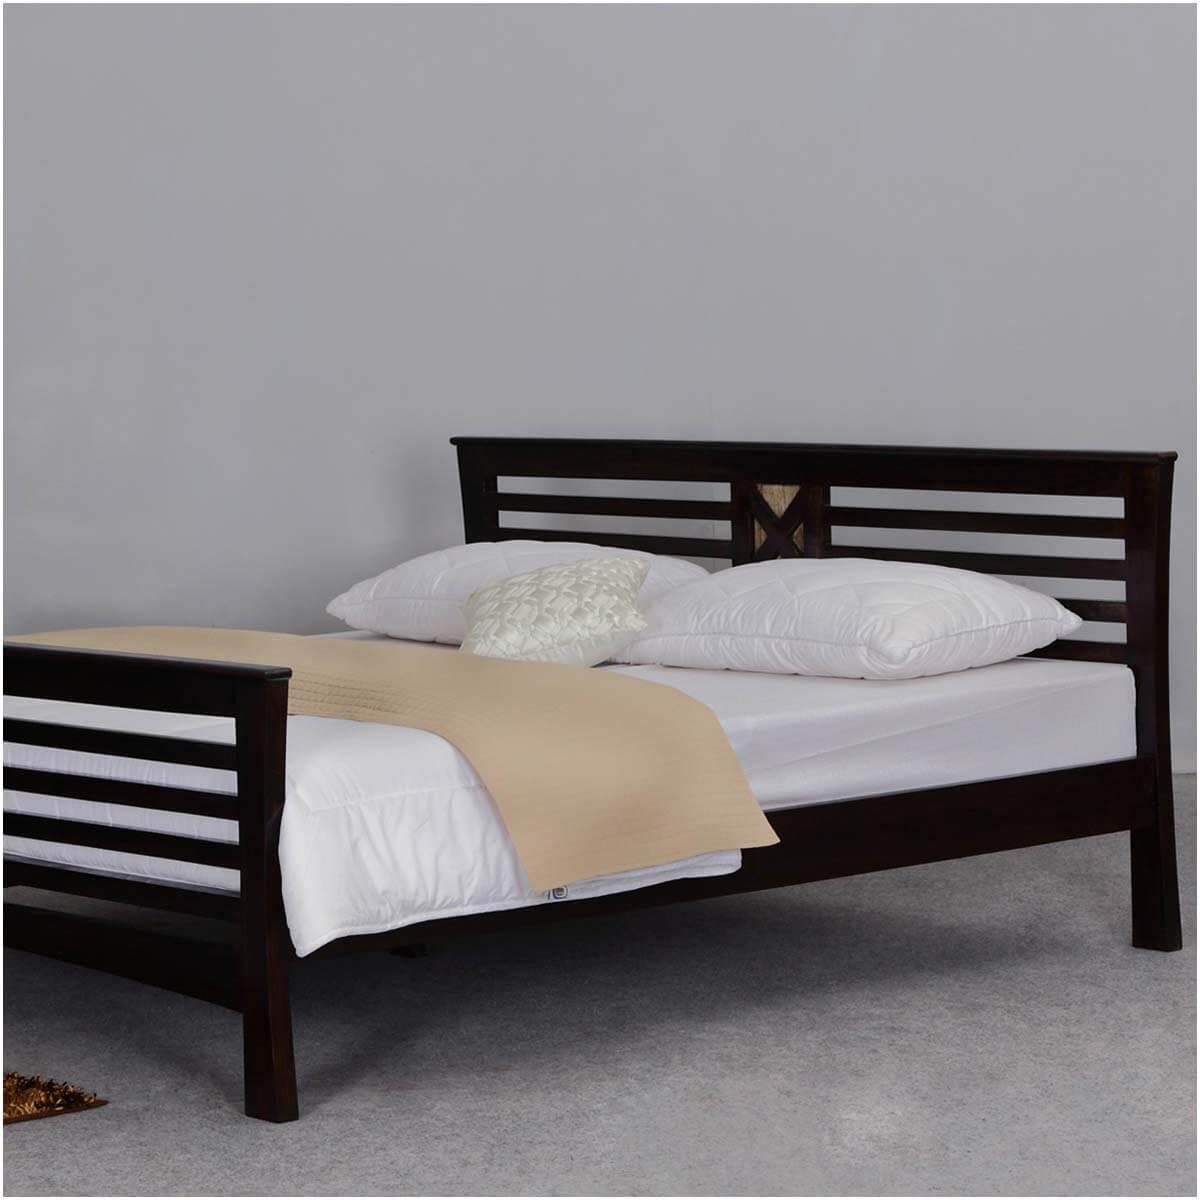 . Texas Solid Wood Modern Platform Bed Frame w Headboard   Footboard